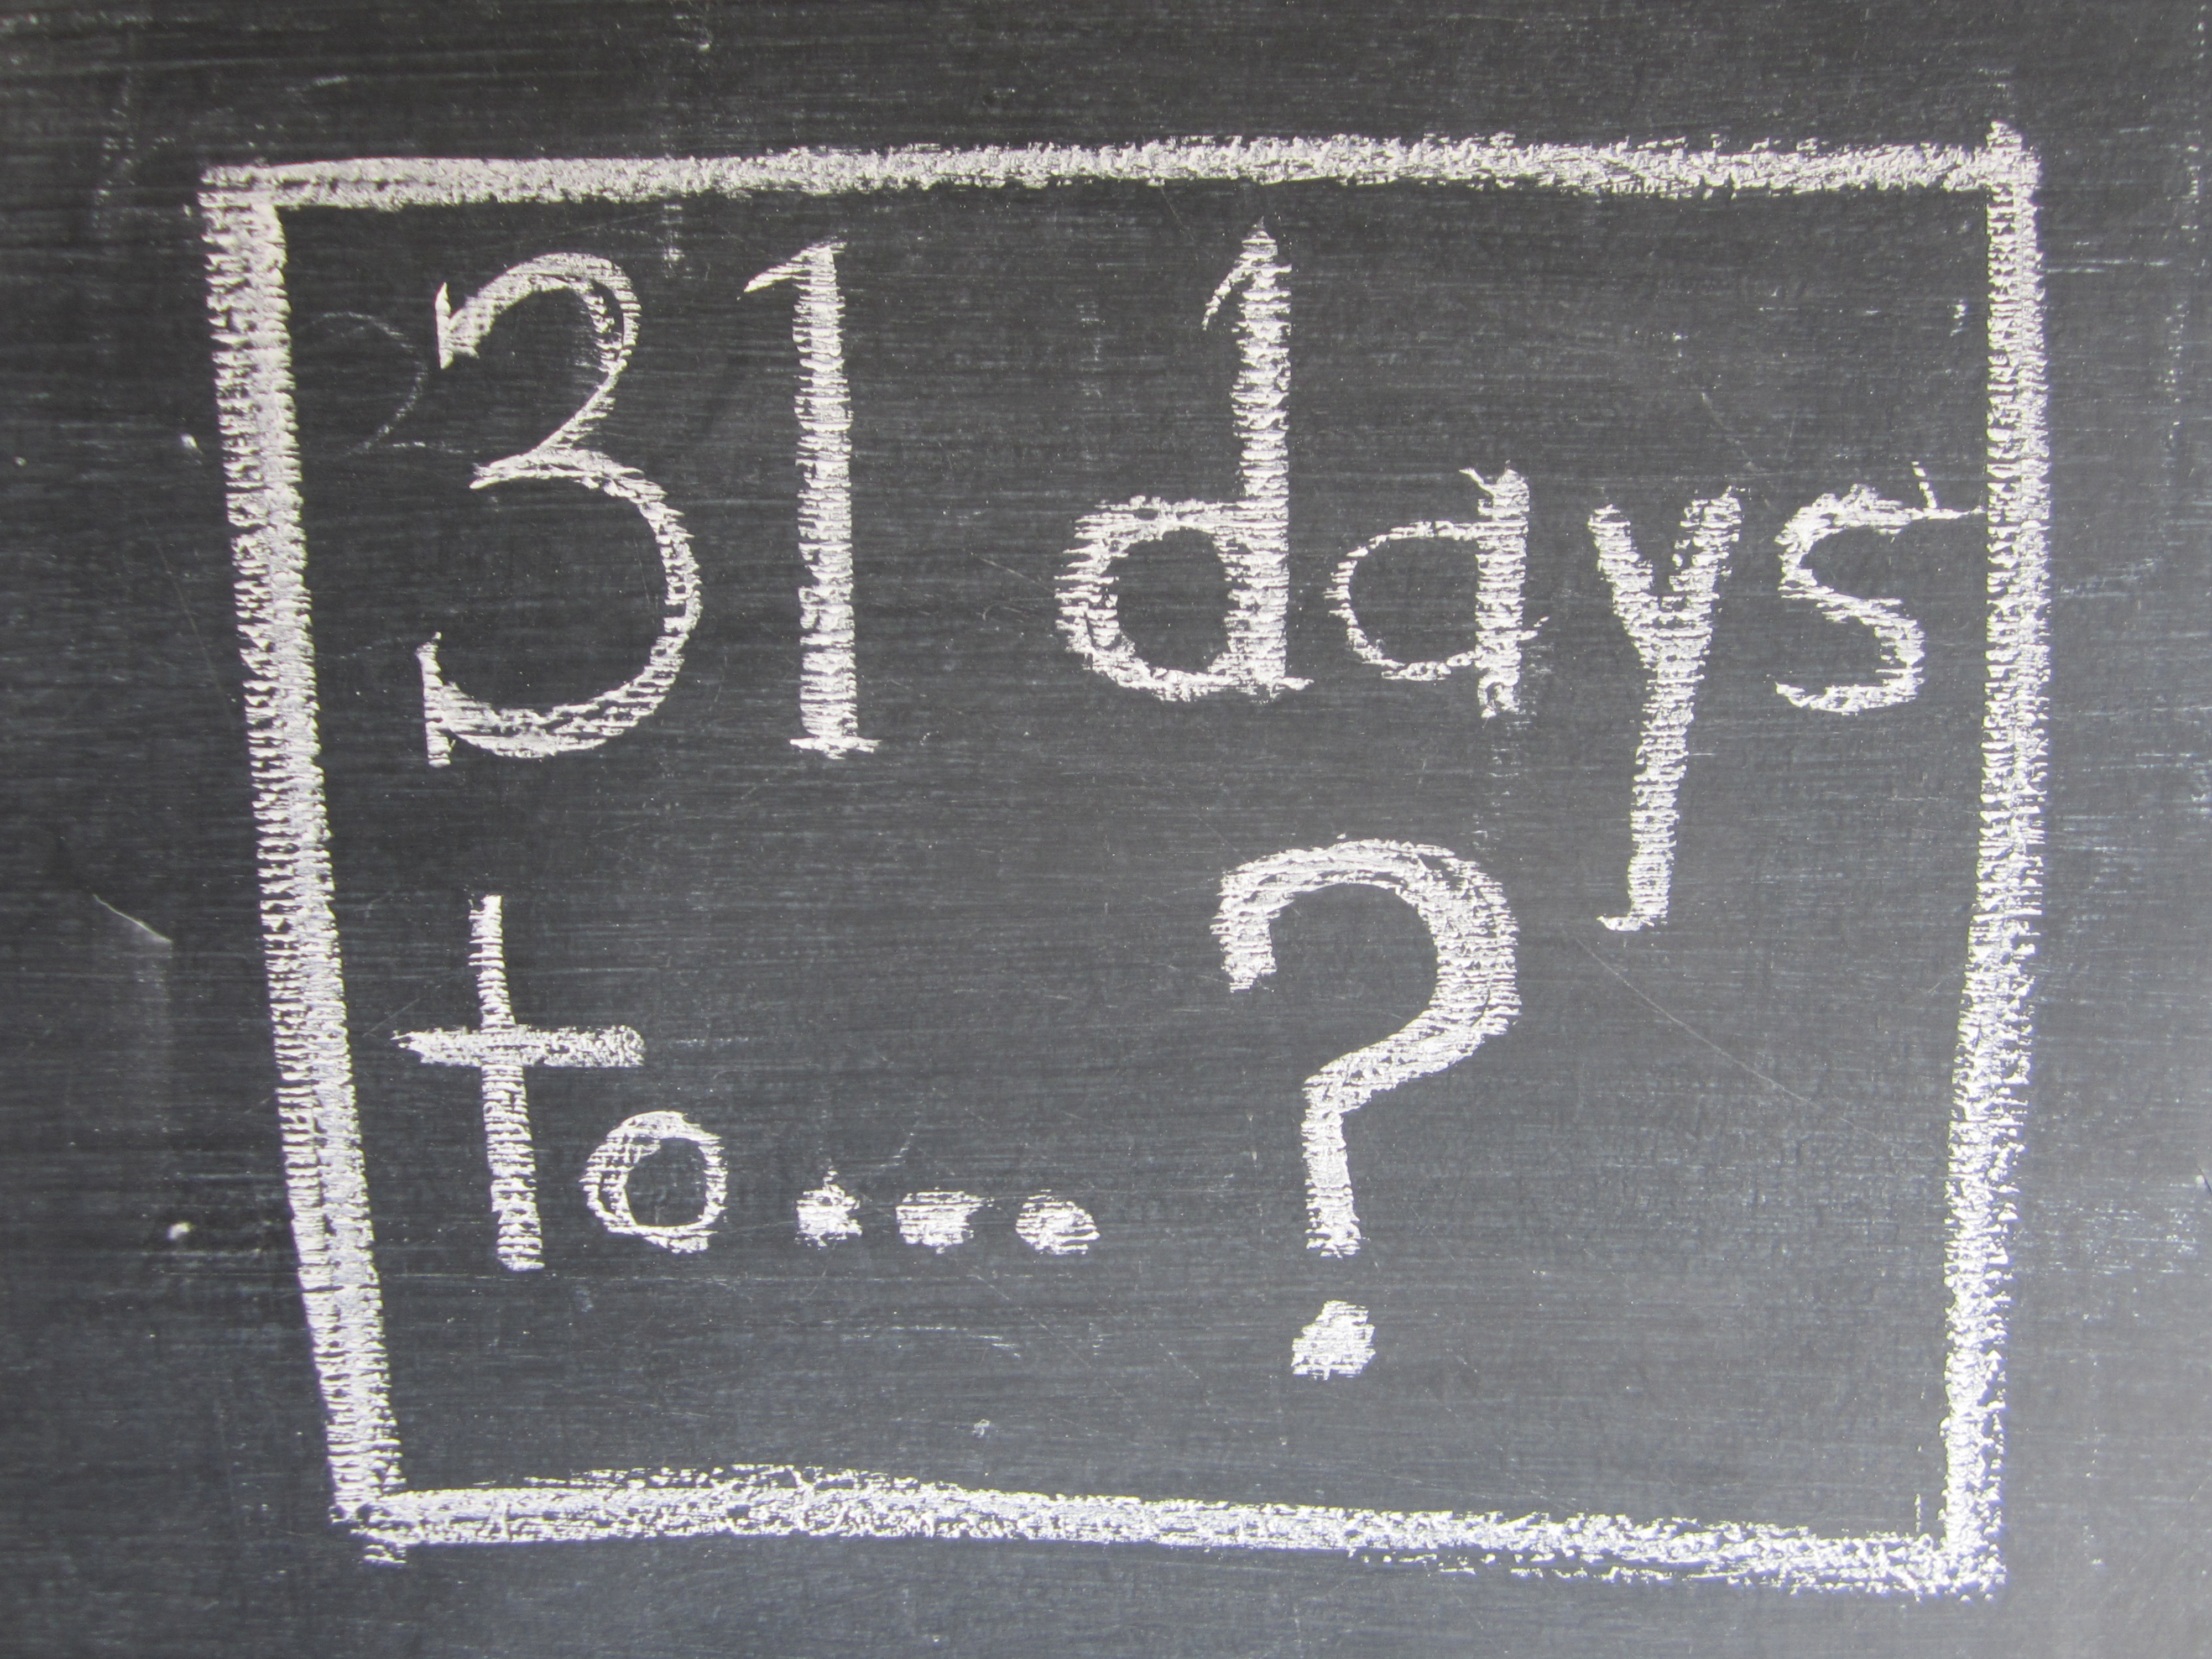 31 days to…?